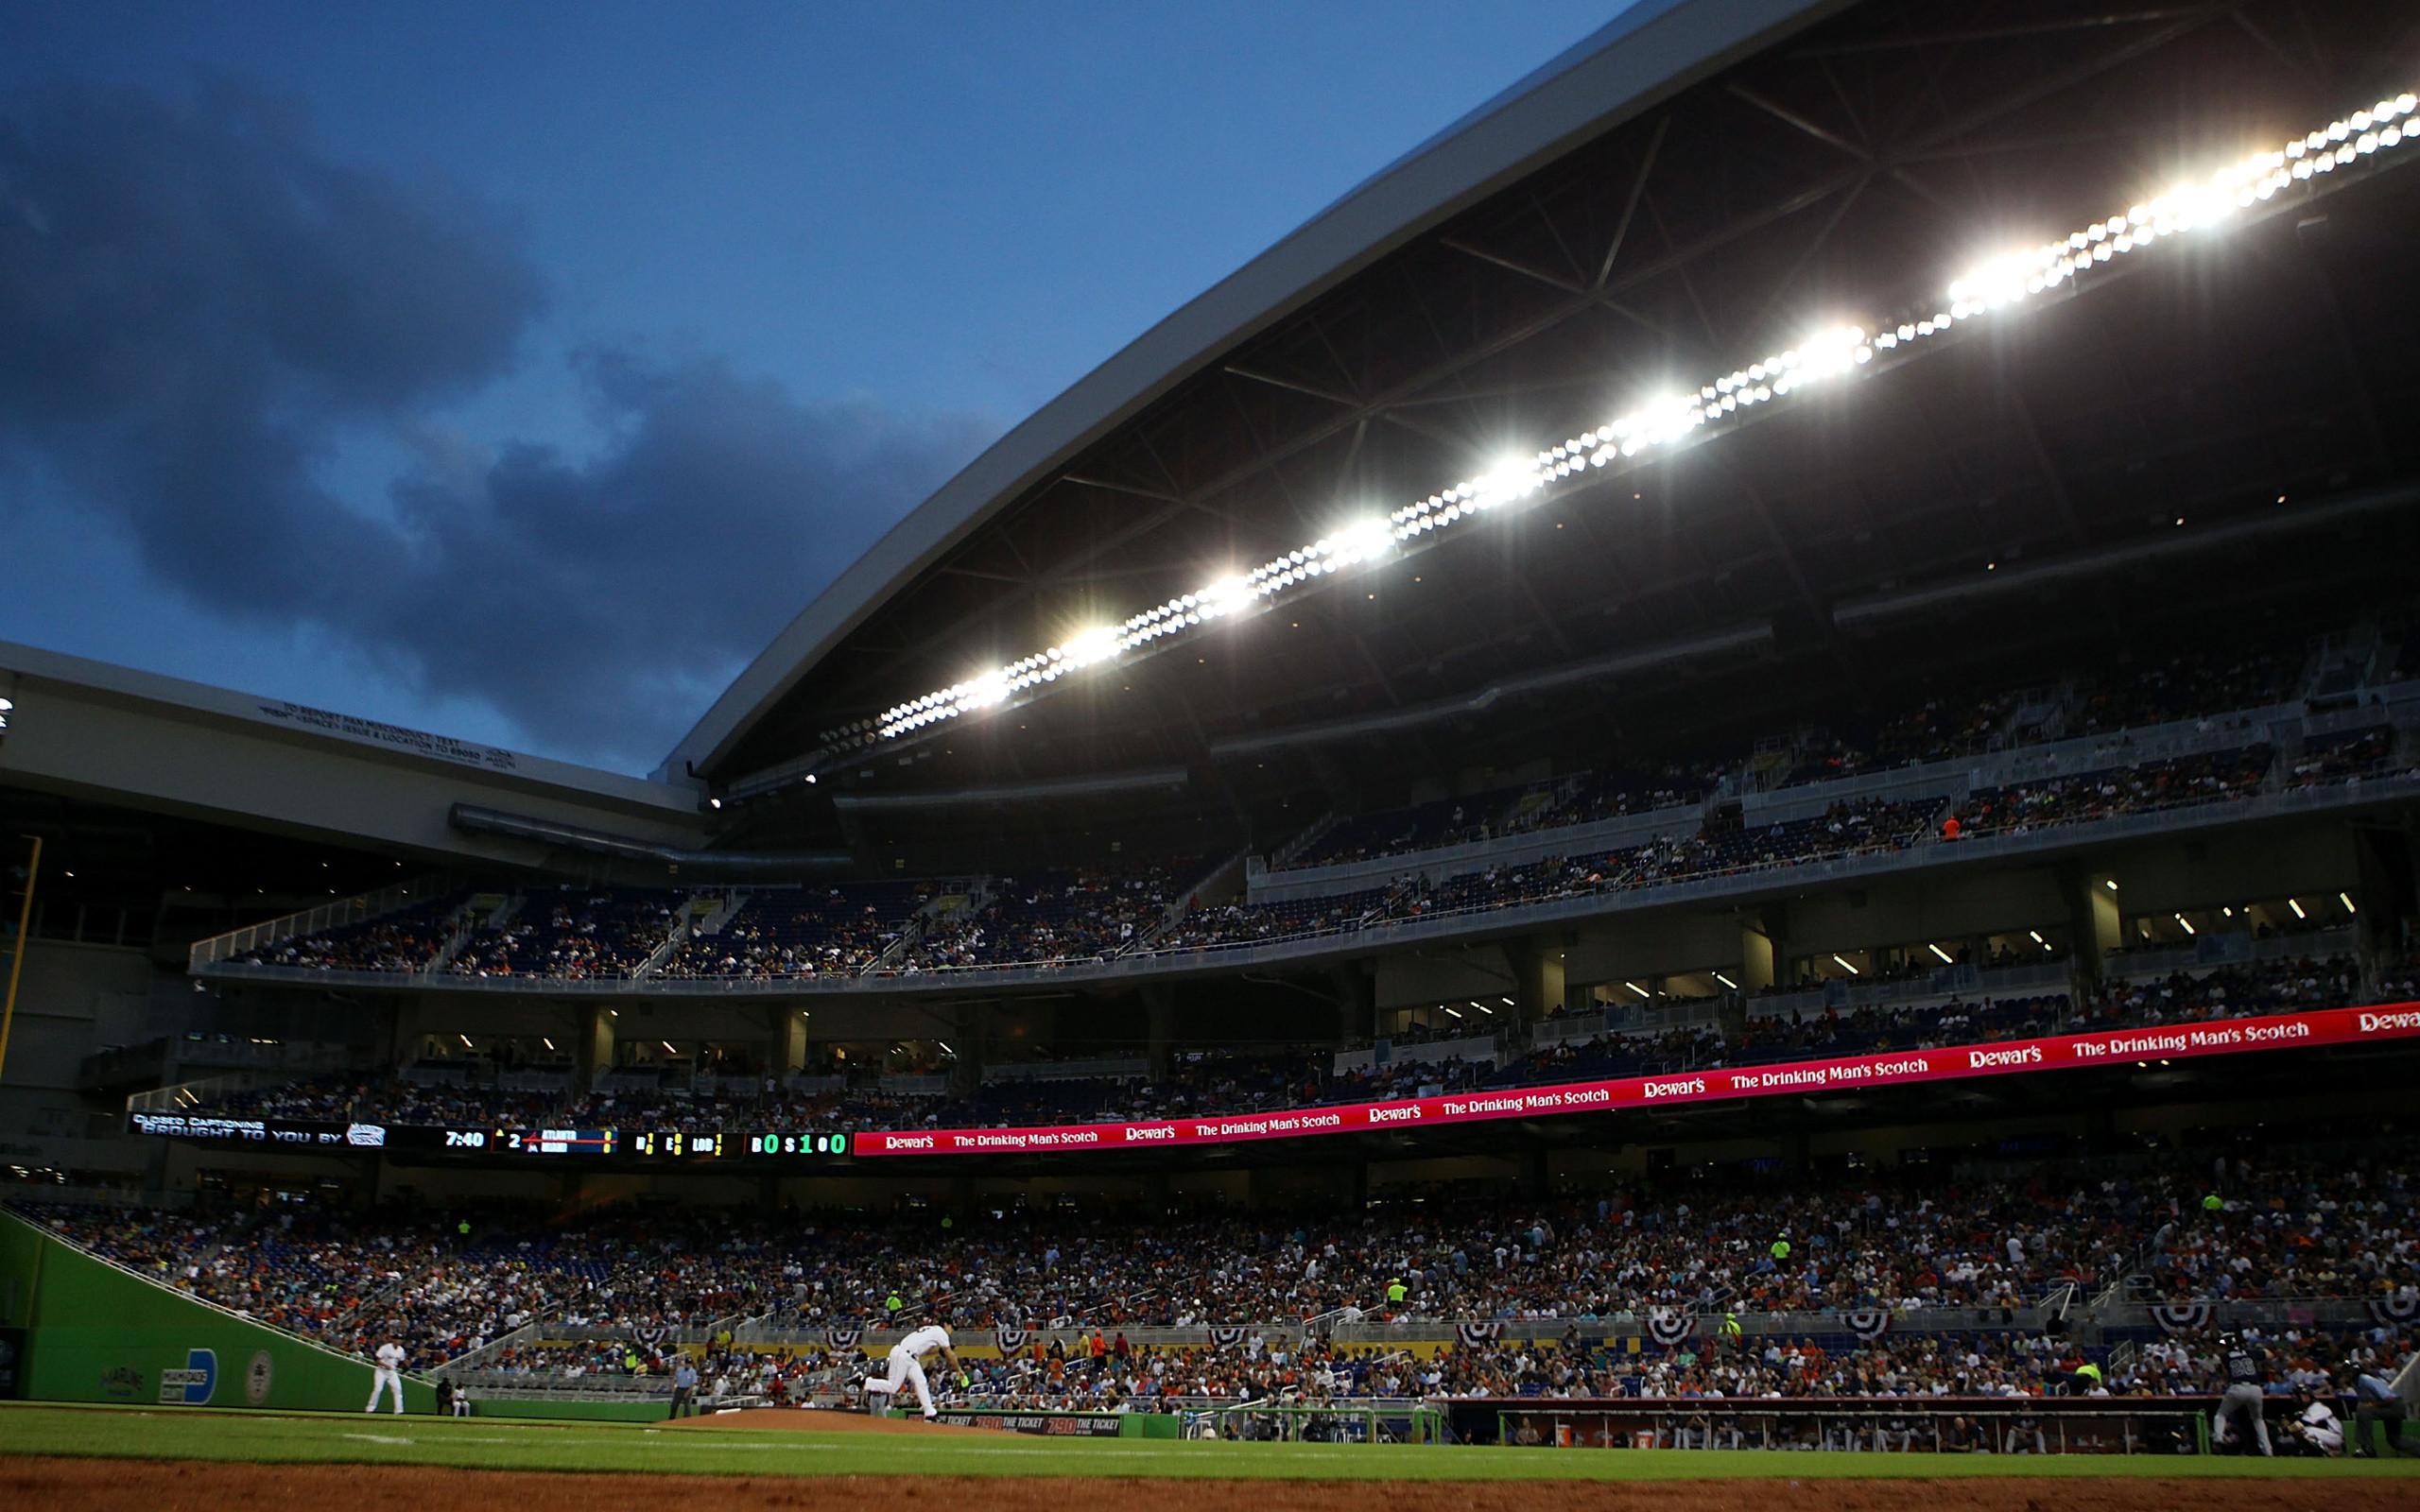 … baseball stadium miami marlins baseball stadium …